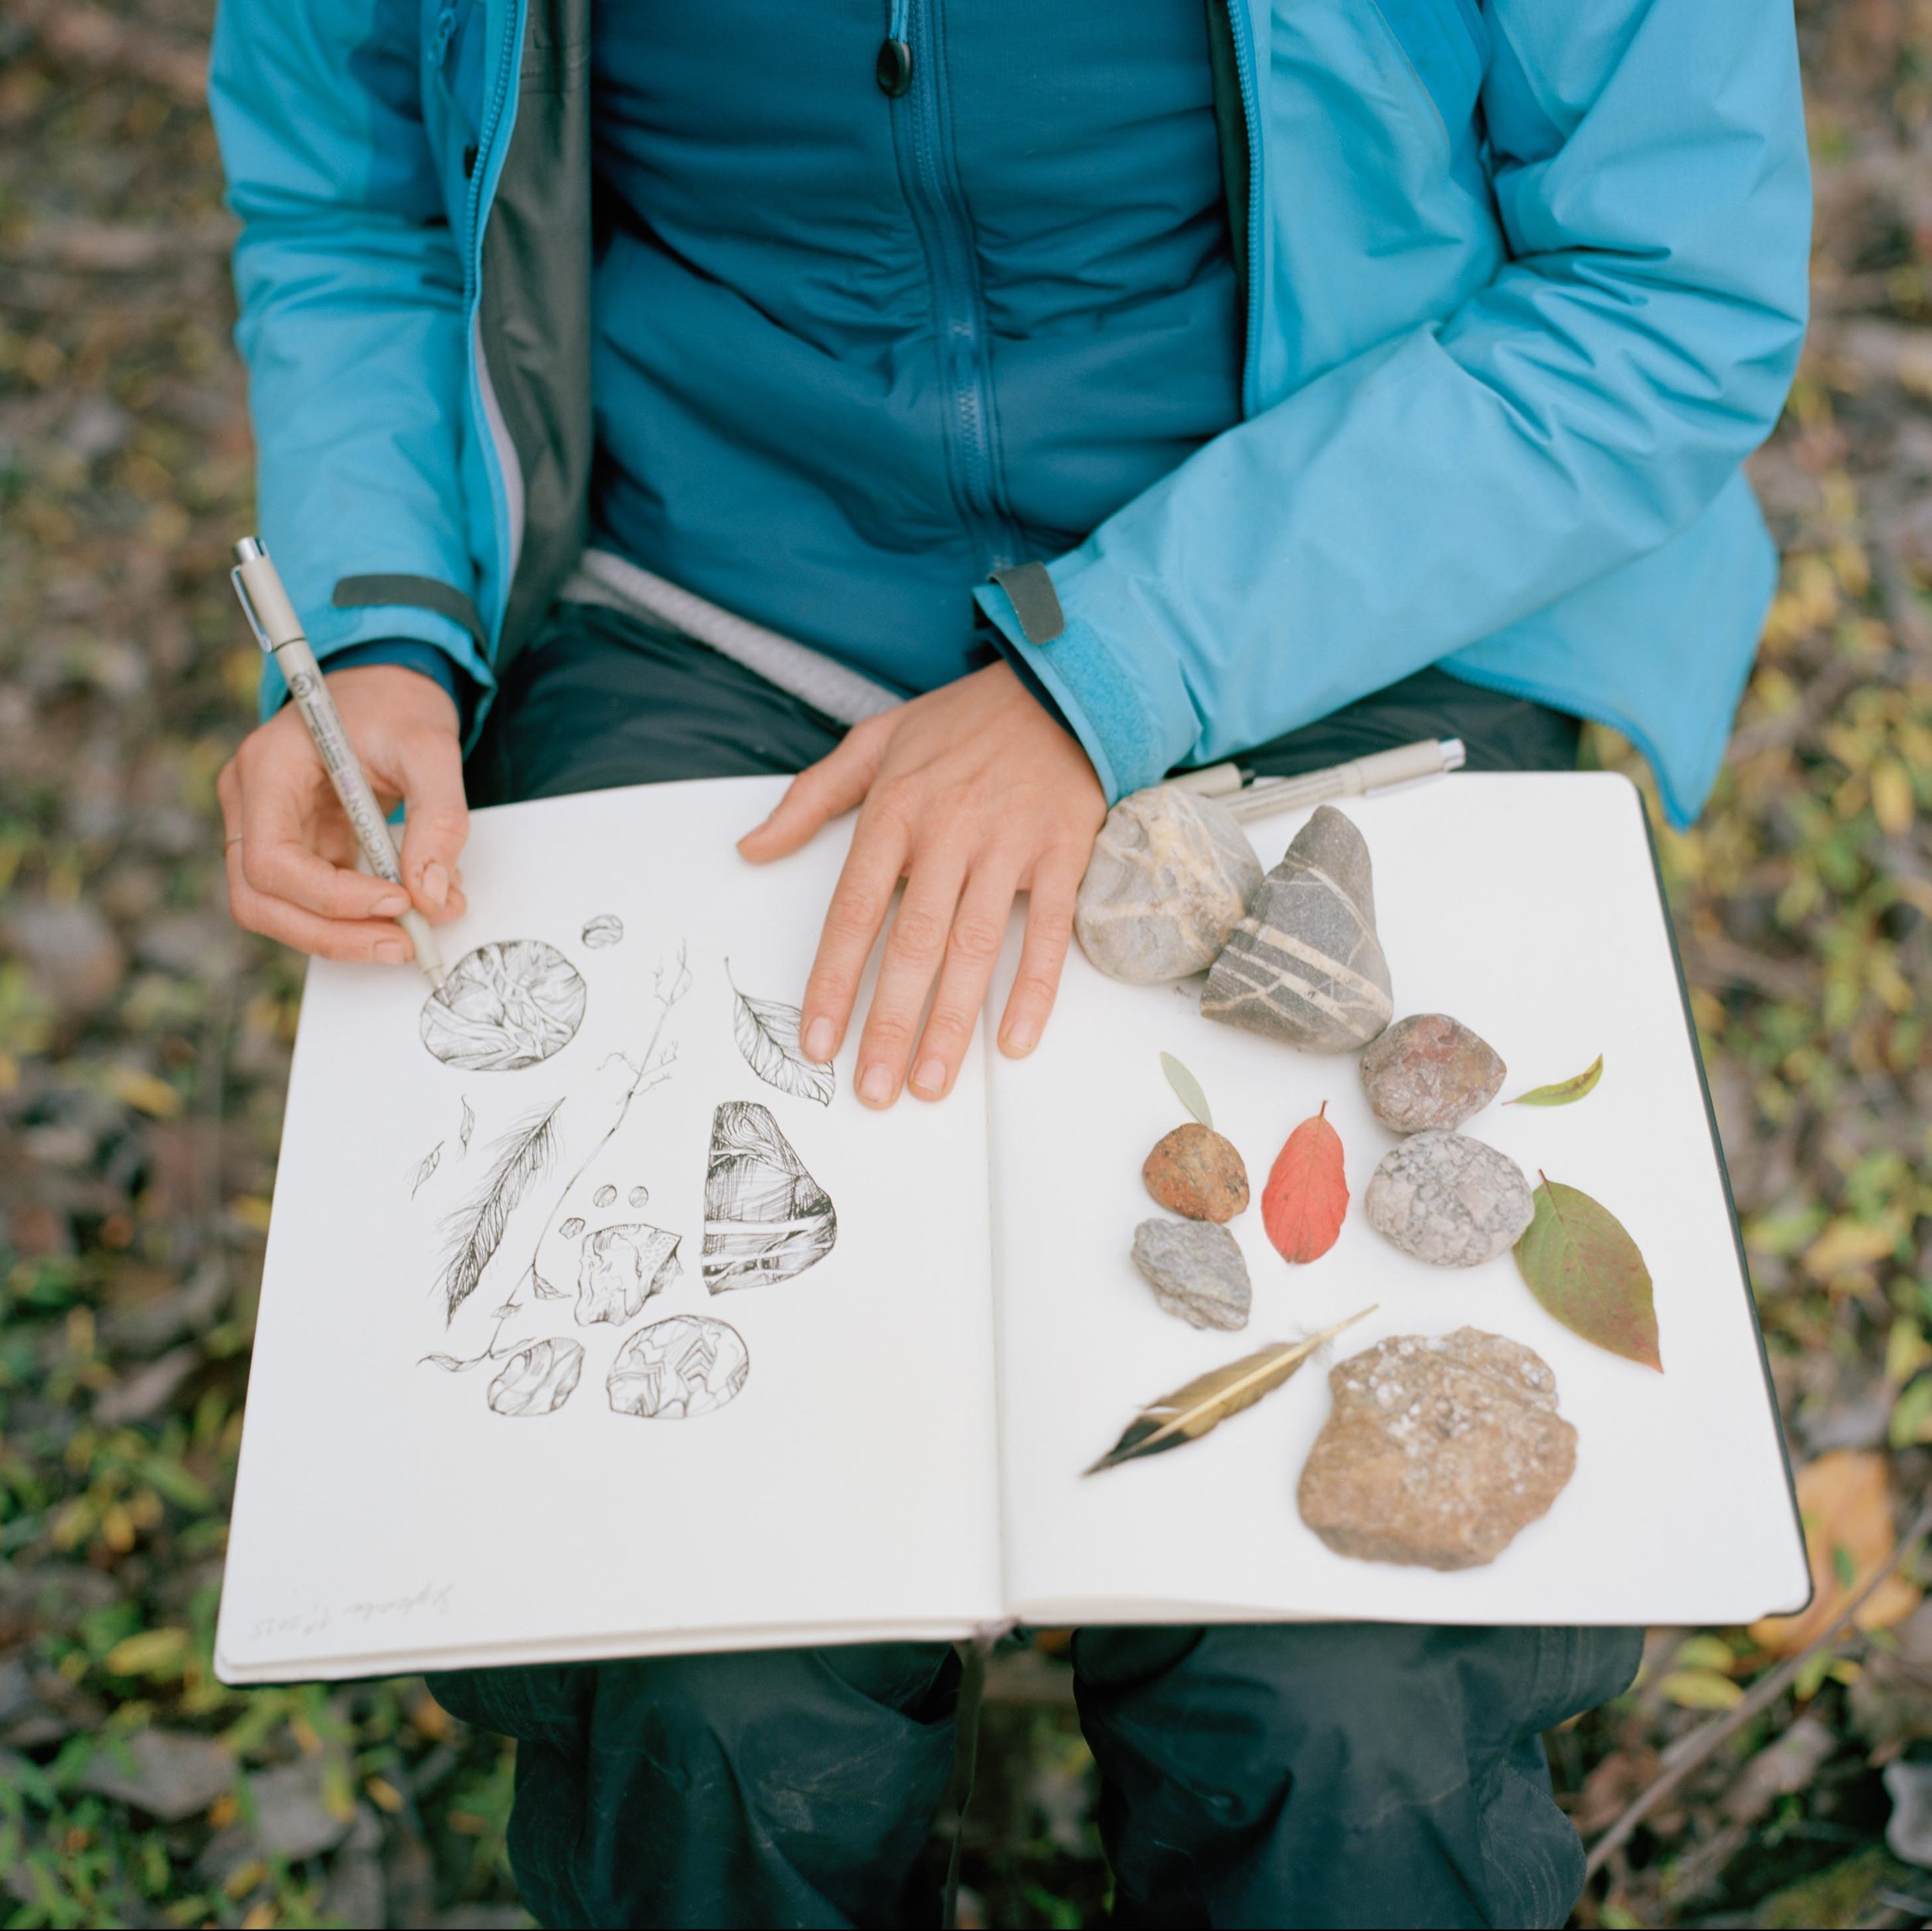 Callan_Field_sketchbook_portrait.jpg